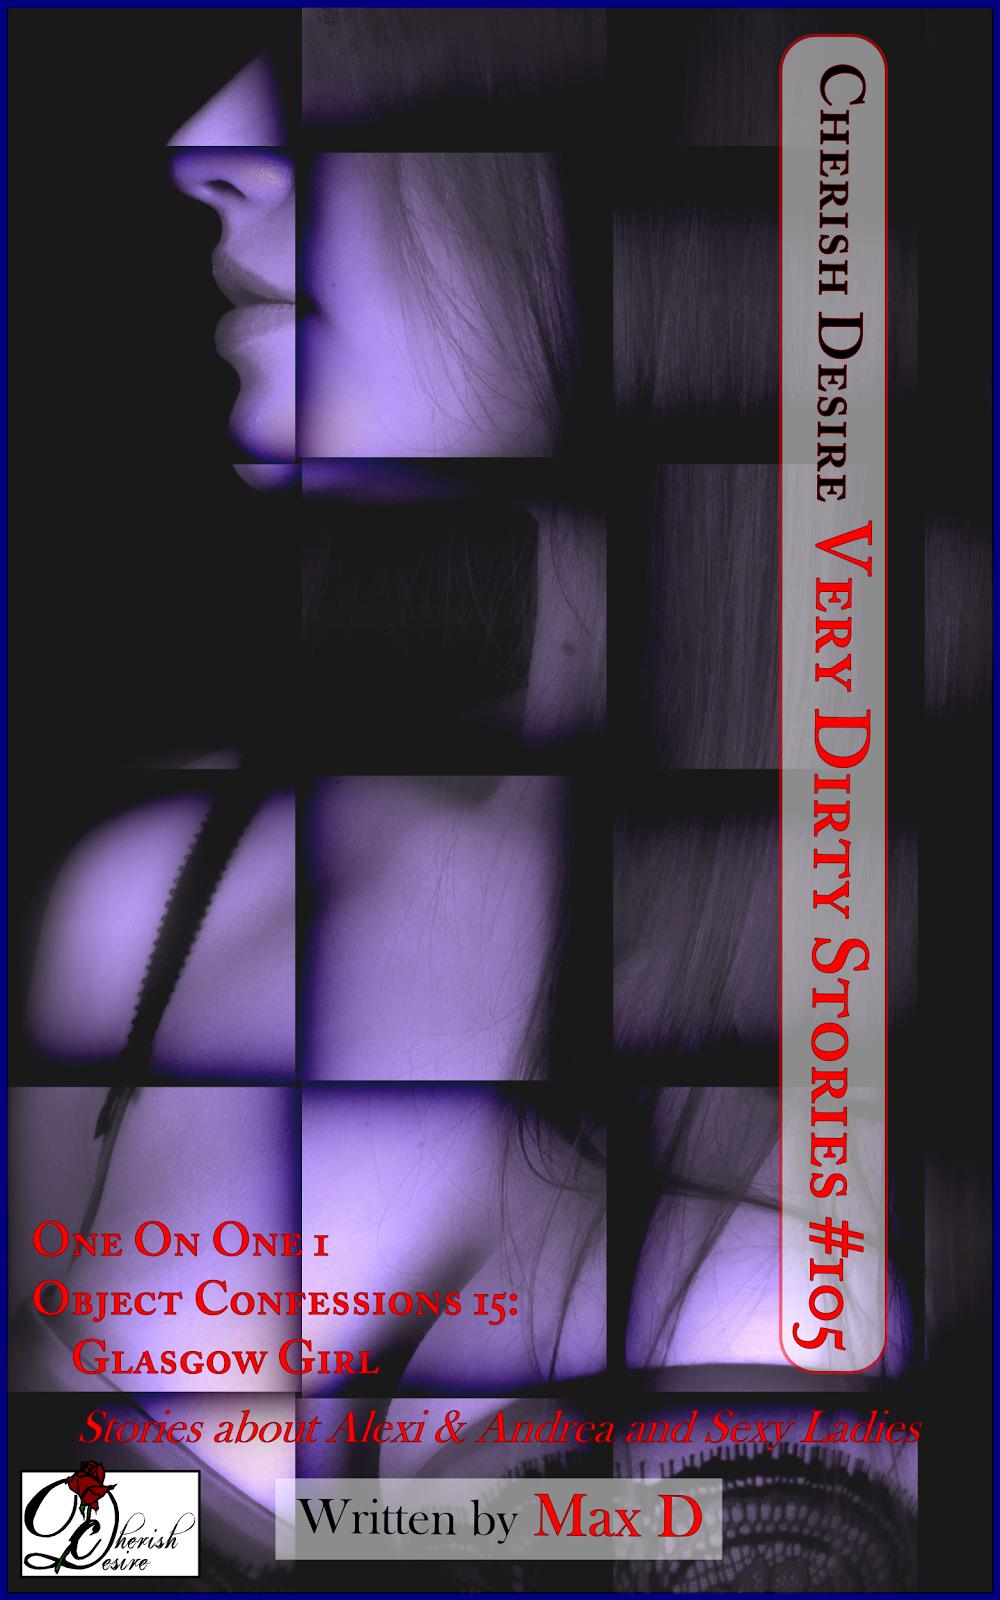 Cherish Desire: Very Dirty Stories #105, Max D, erotica